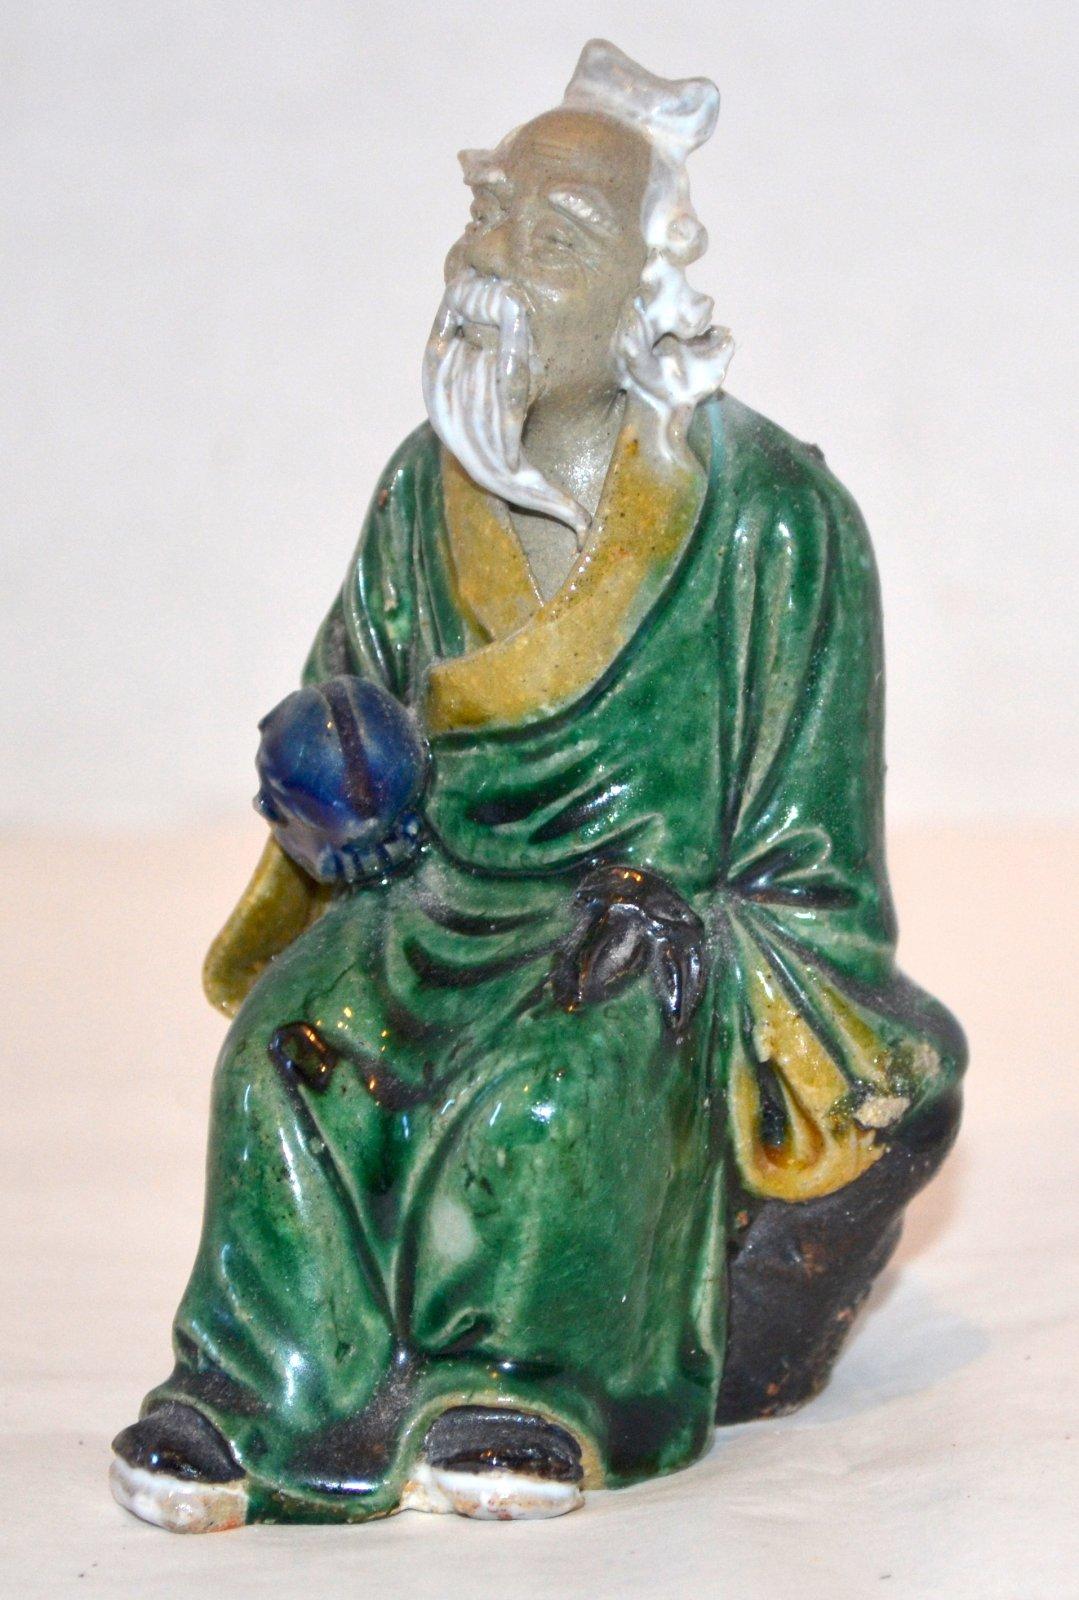 Chinese Mud Man Sitting on a rock ceramic